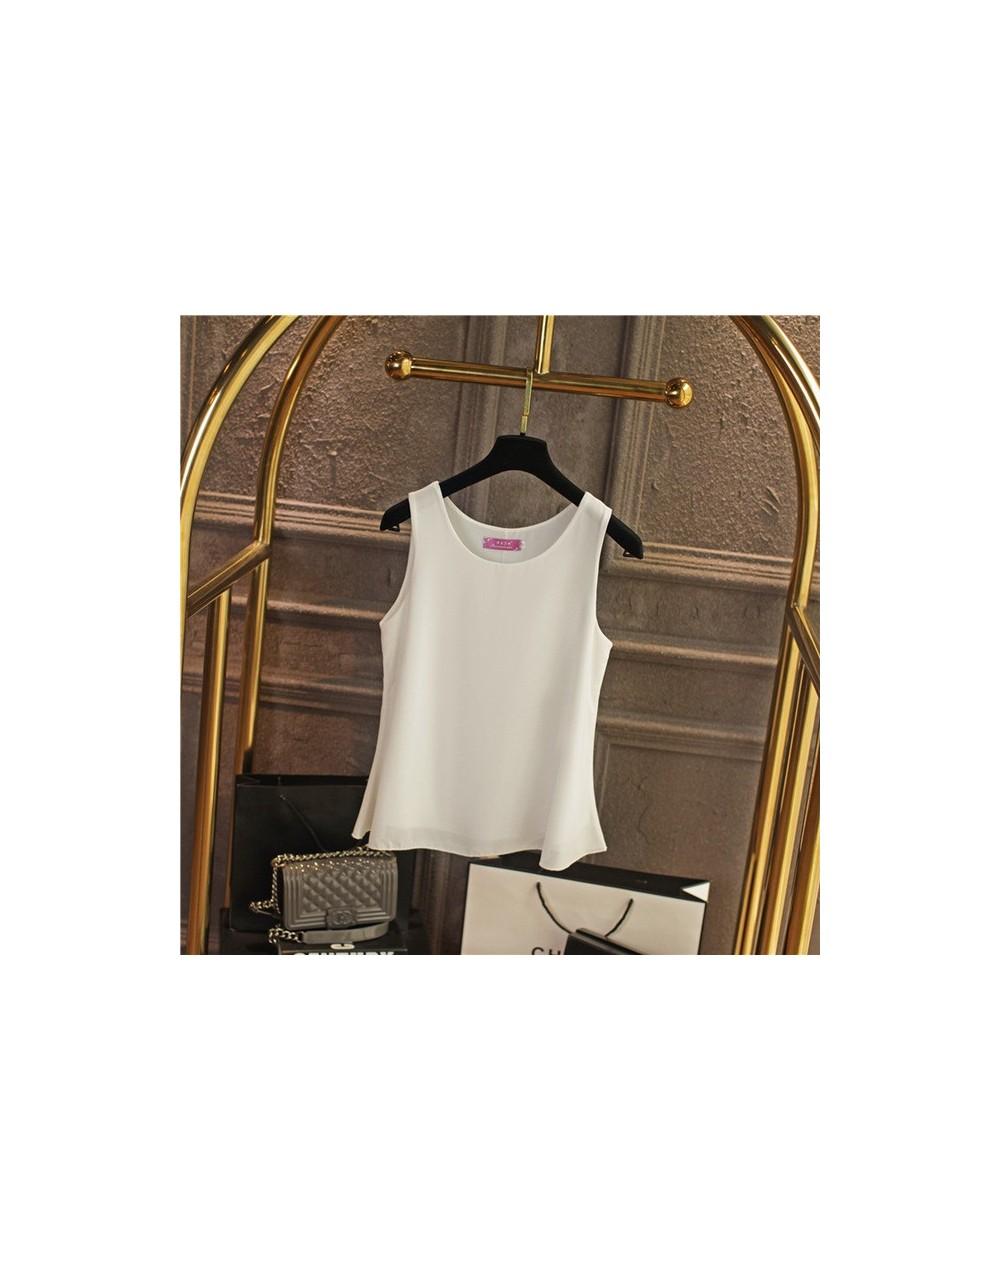 2019 summer New Casual women Chiffon shirt Red Chiffon blouse Plus size O-neck blouses sleeveless Loose female Vest Tops - W...